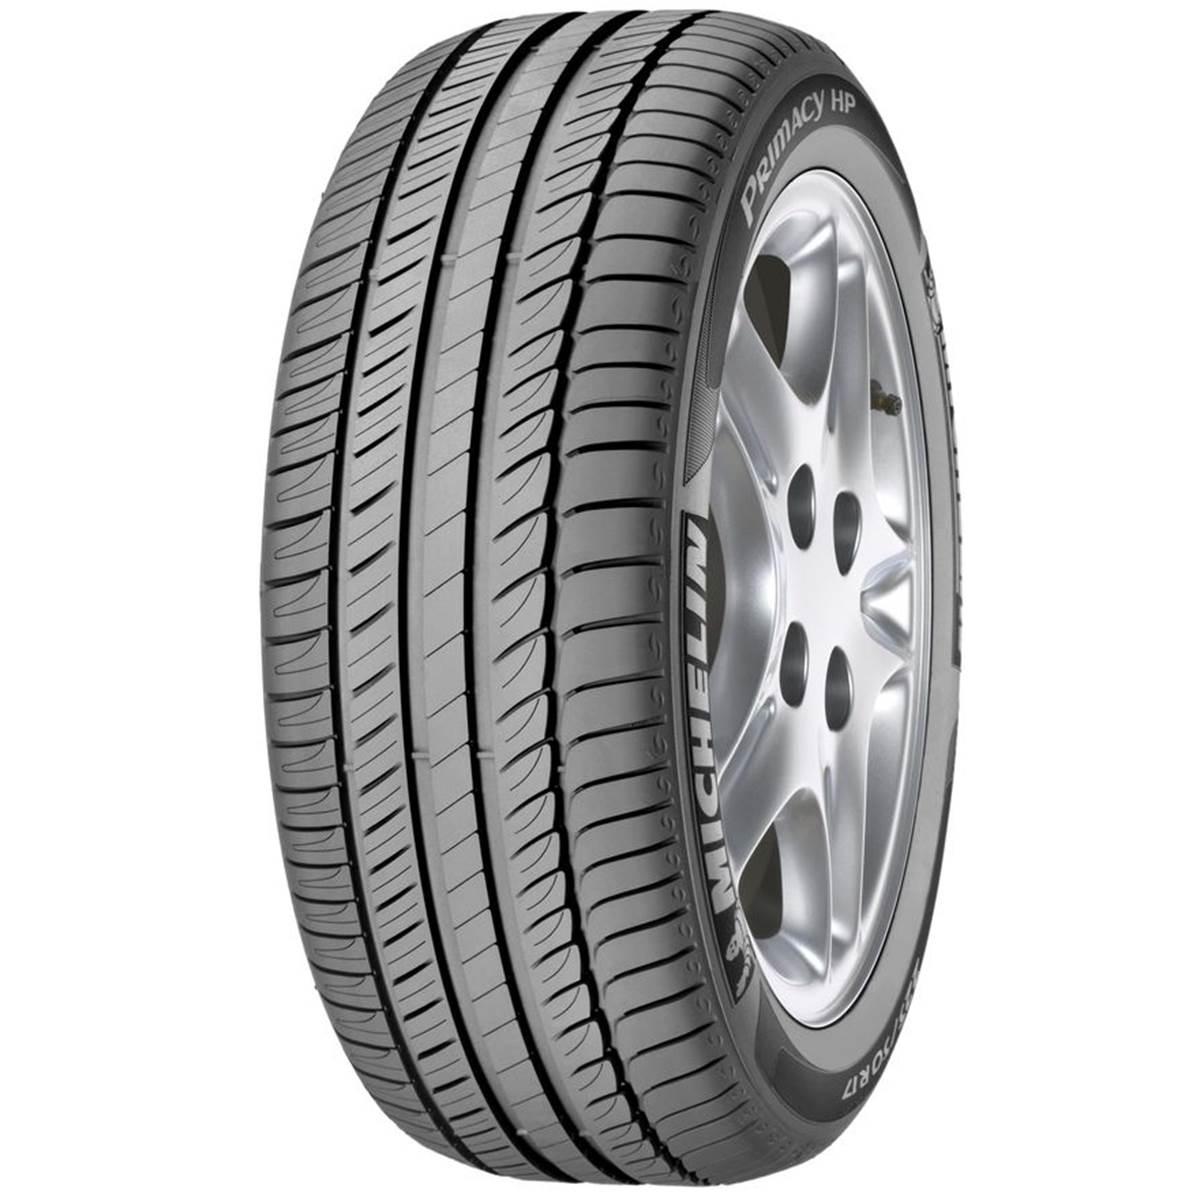 Pneu Michelin 245/40R17 91W Primacy Hp